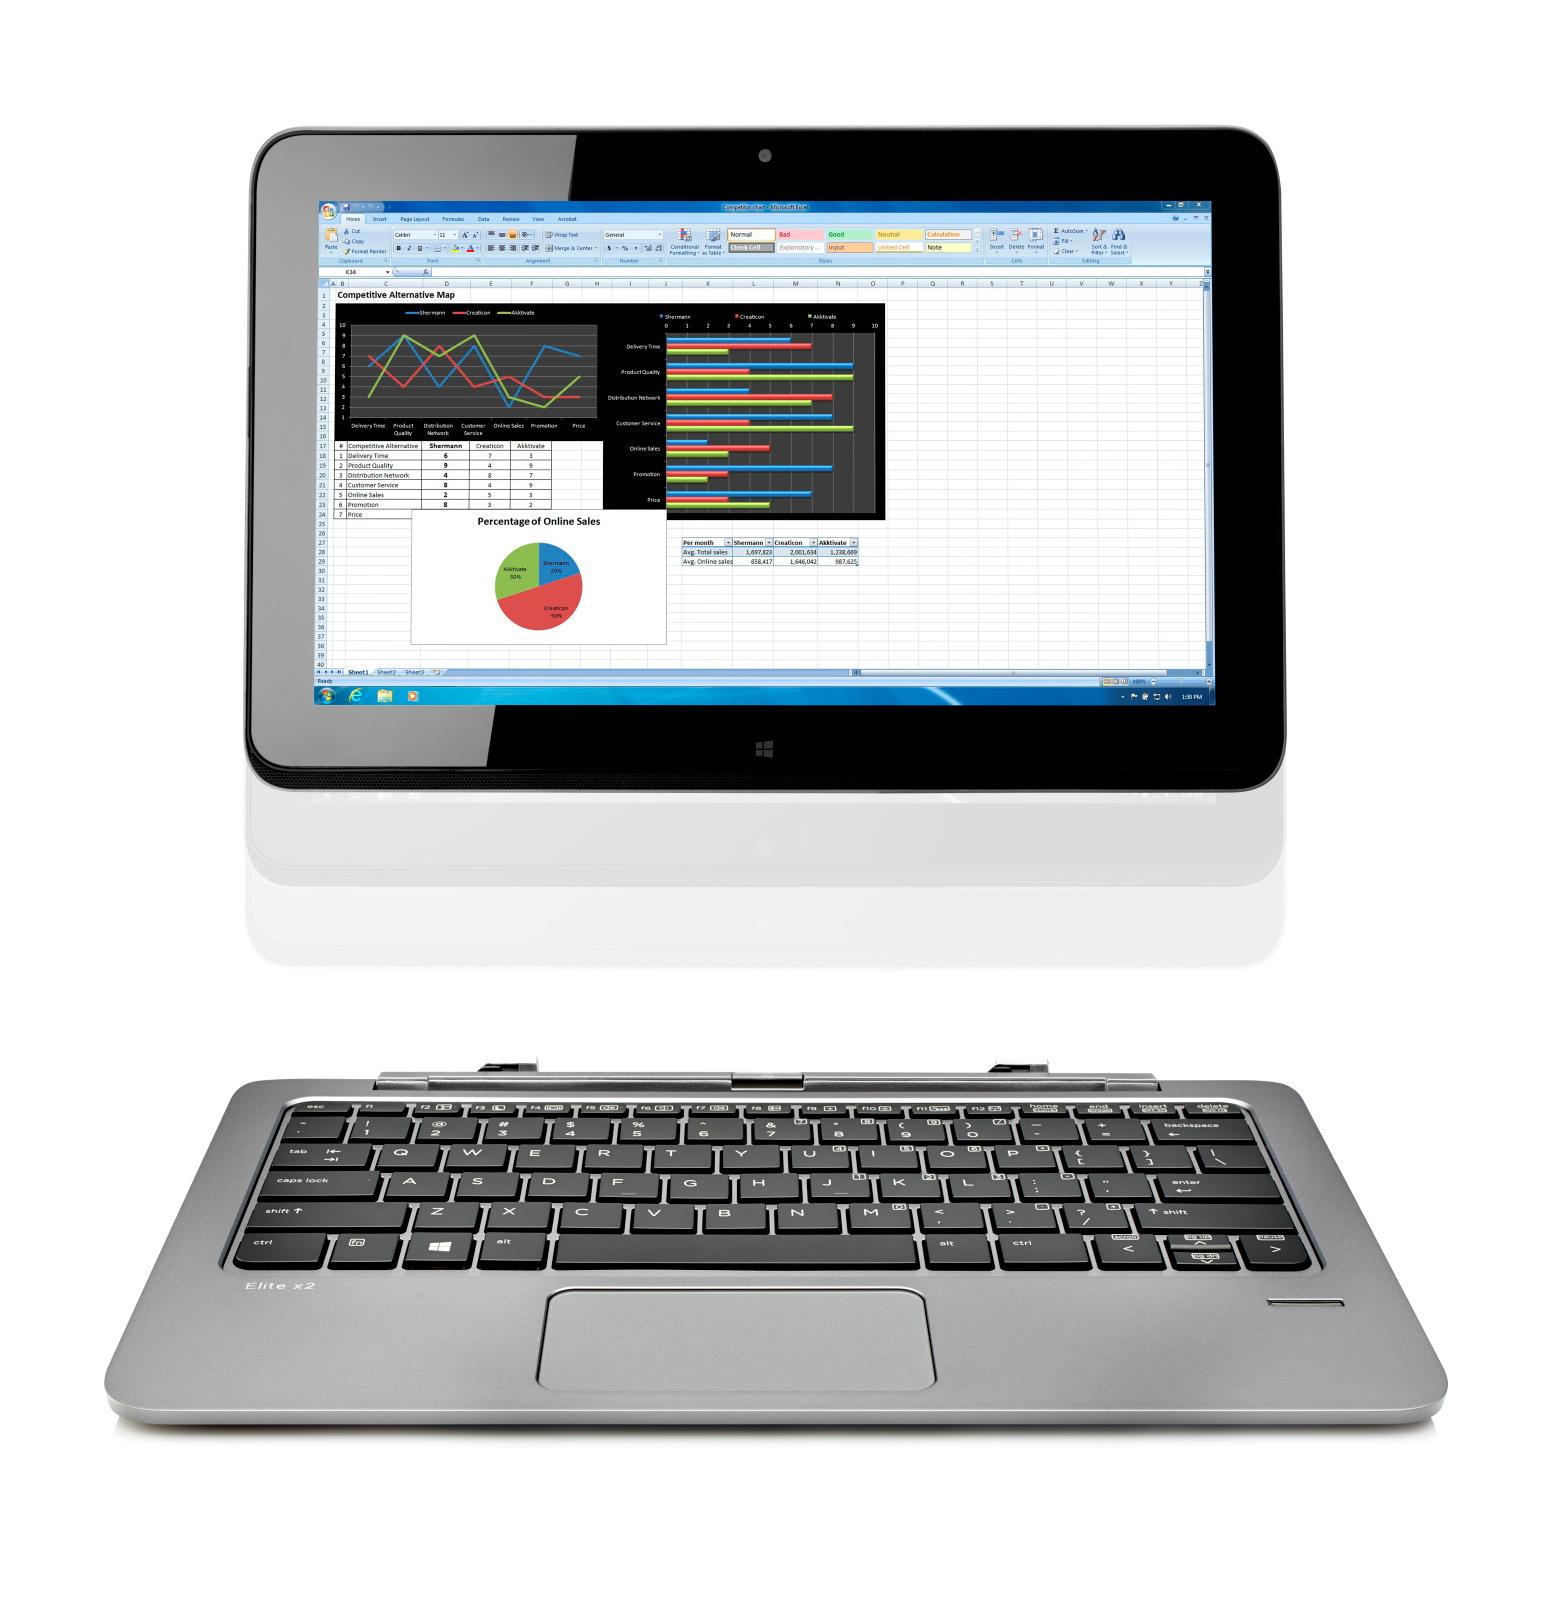 HP Elite x2 1011 G1 11.6 HD TOUCH/M-5Y10c/4G/128SSD/DP/WIFI/BT/MCR/FPR/1RServis//W8.1P